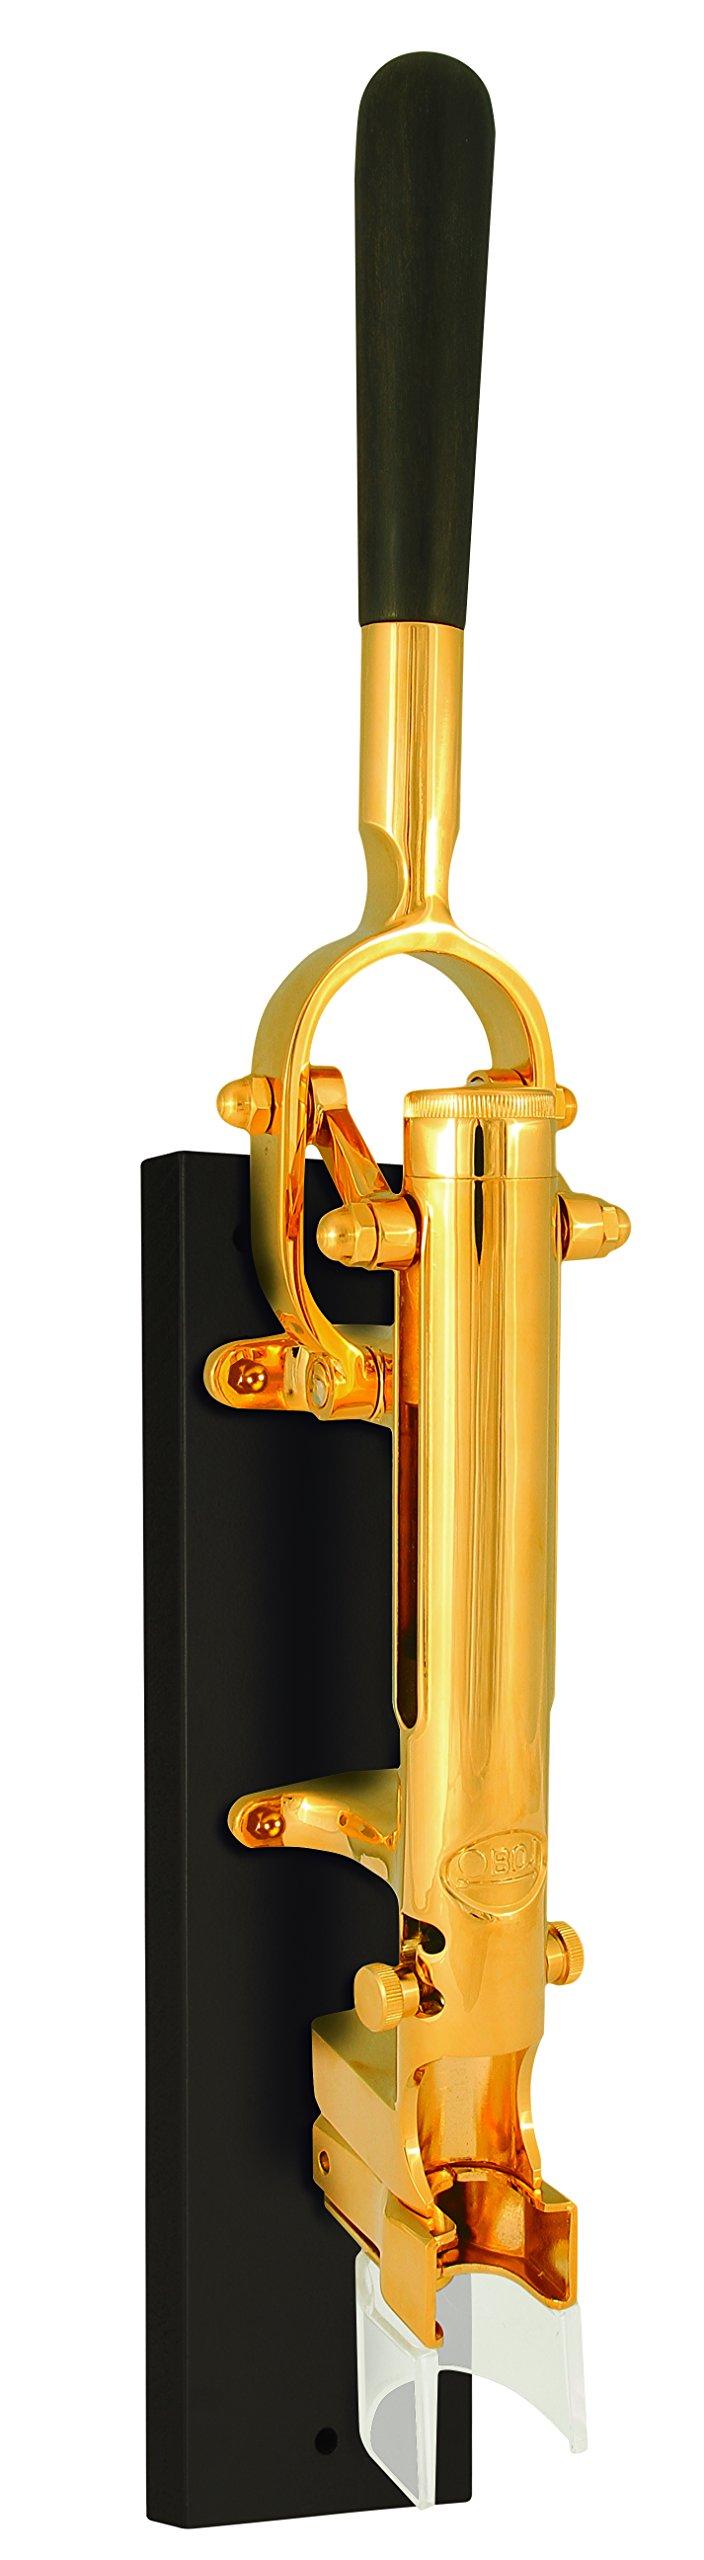 Boj Olaneta 01046104 Gold Plated Wall-Mounted Corkscrew with Wood Backing, Zamak